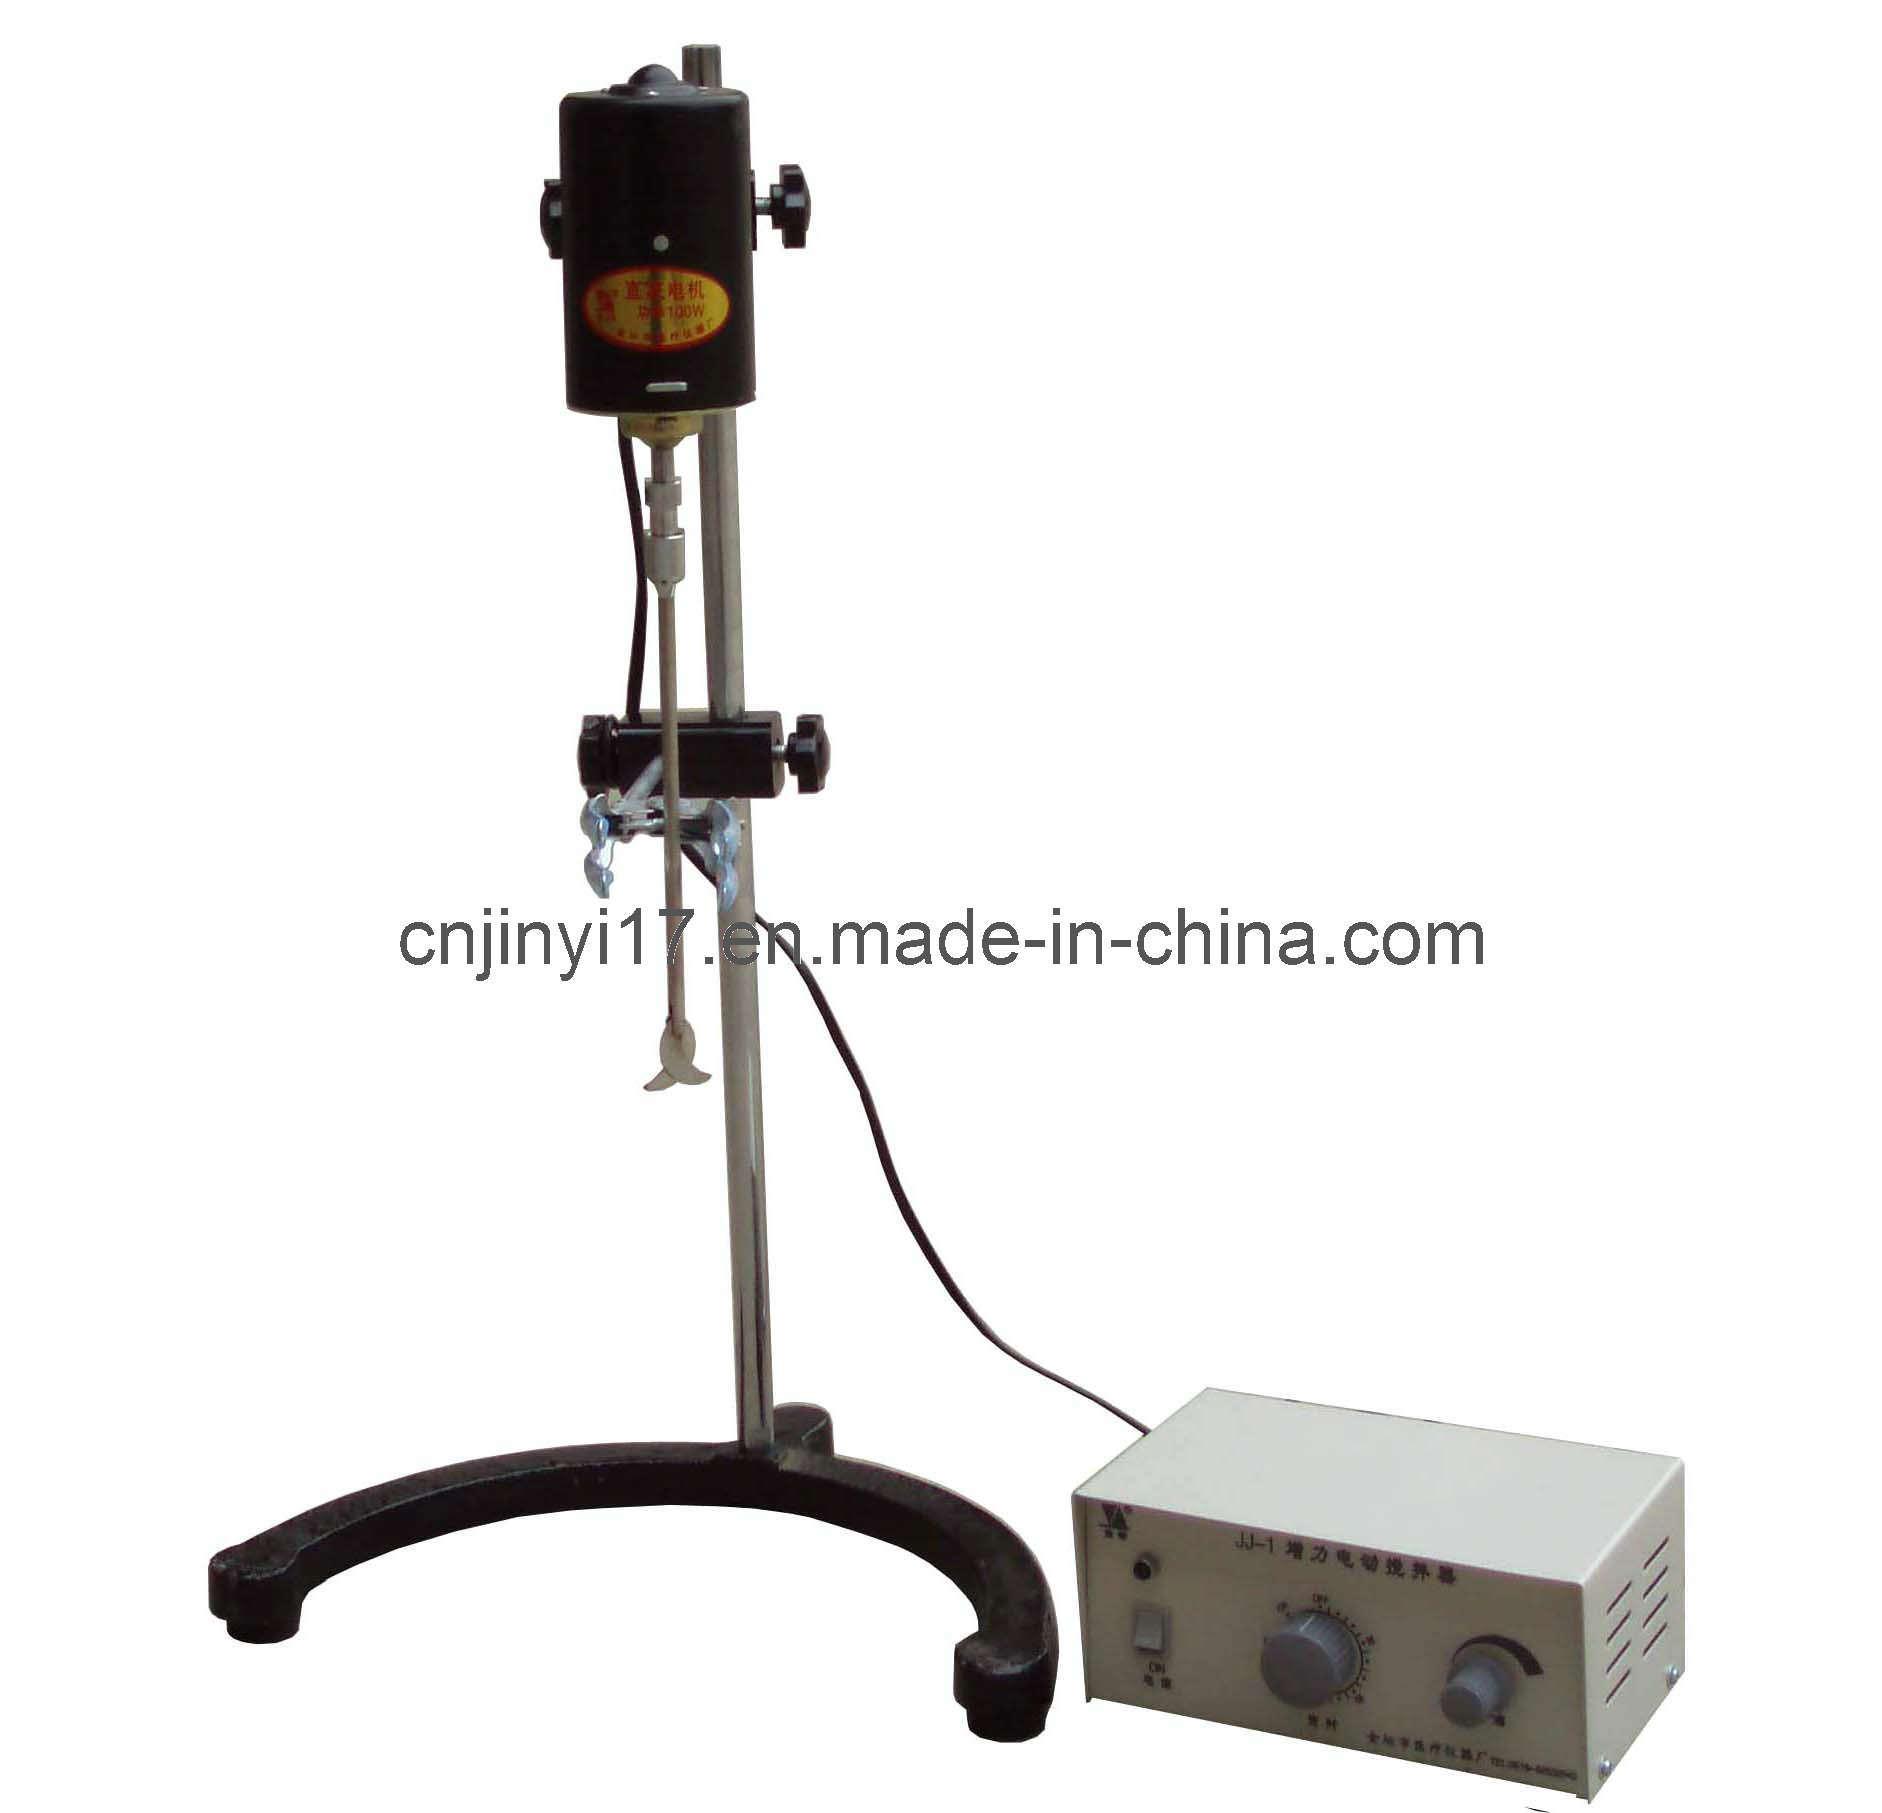 China Jj 1 Laboratory Accurate Electric Stirrer Mixer